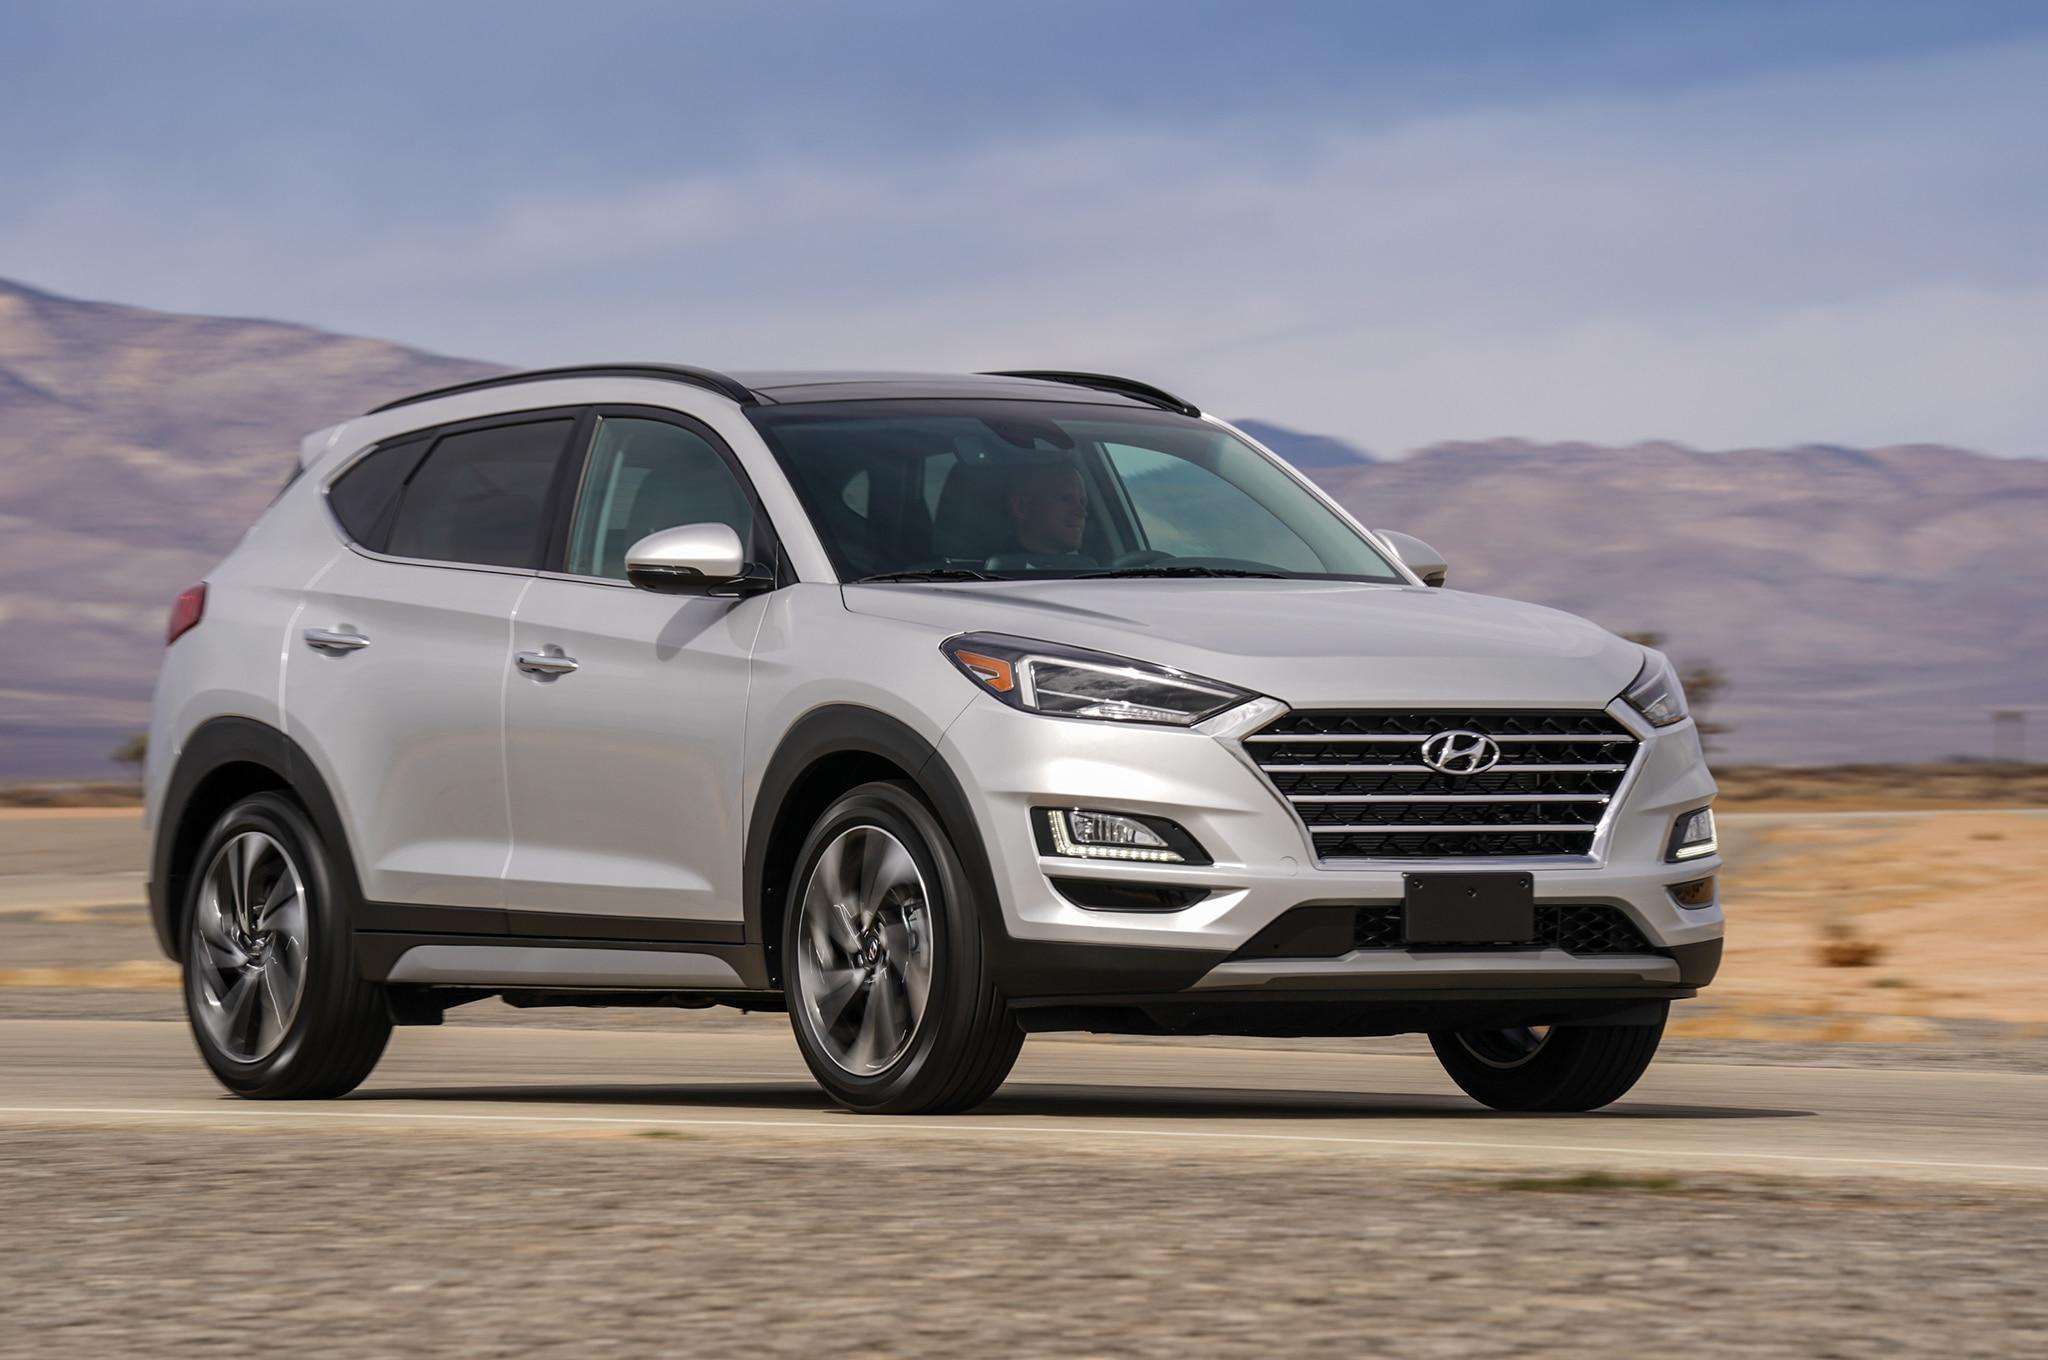 2019 Hyundai Tucson Front Three Quarter In Motion 03